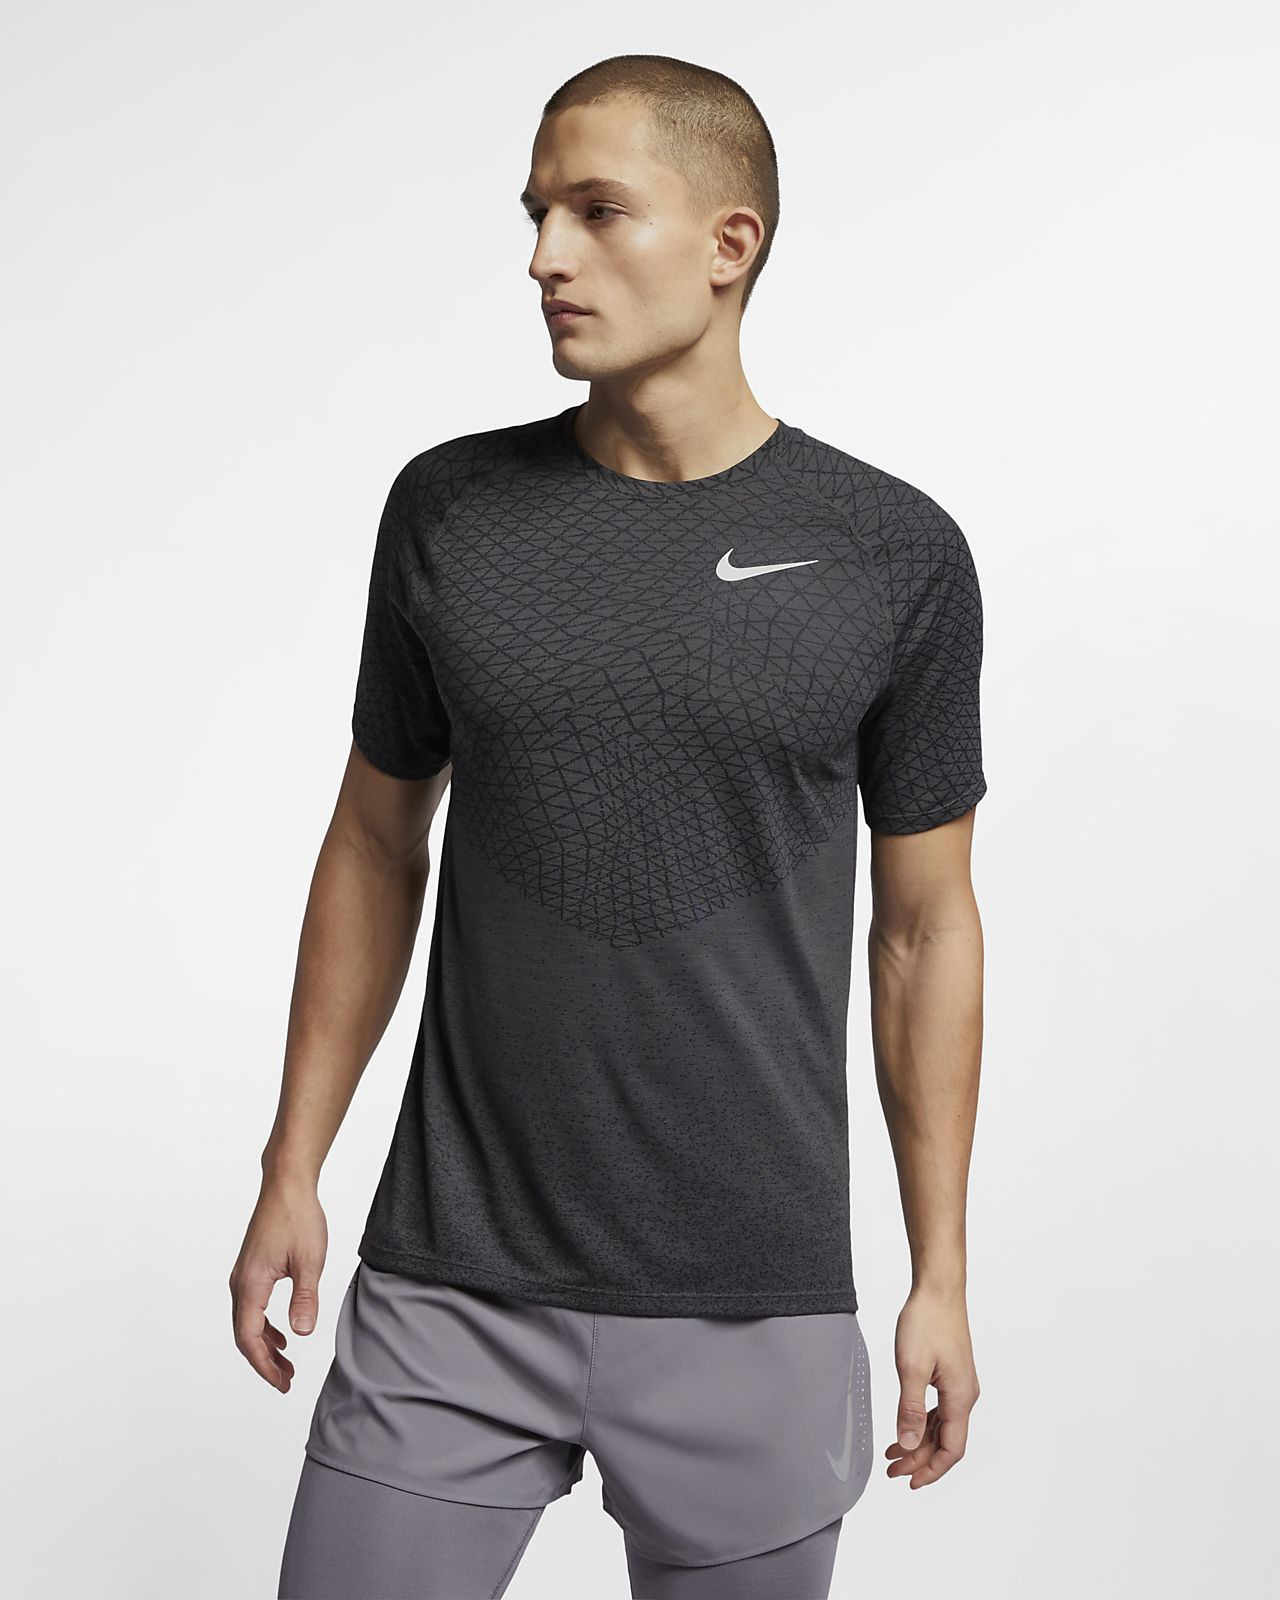 Nike Medalist 男子短袖跑步上衣